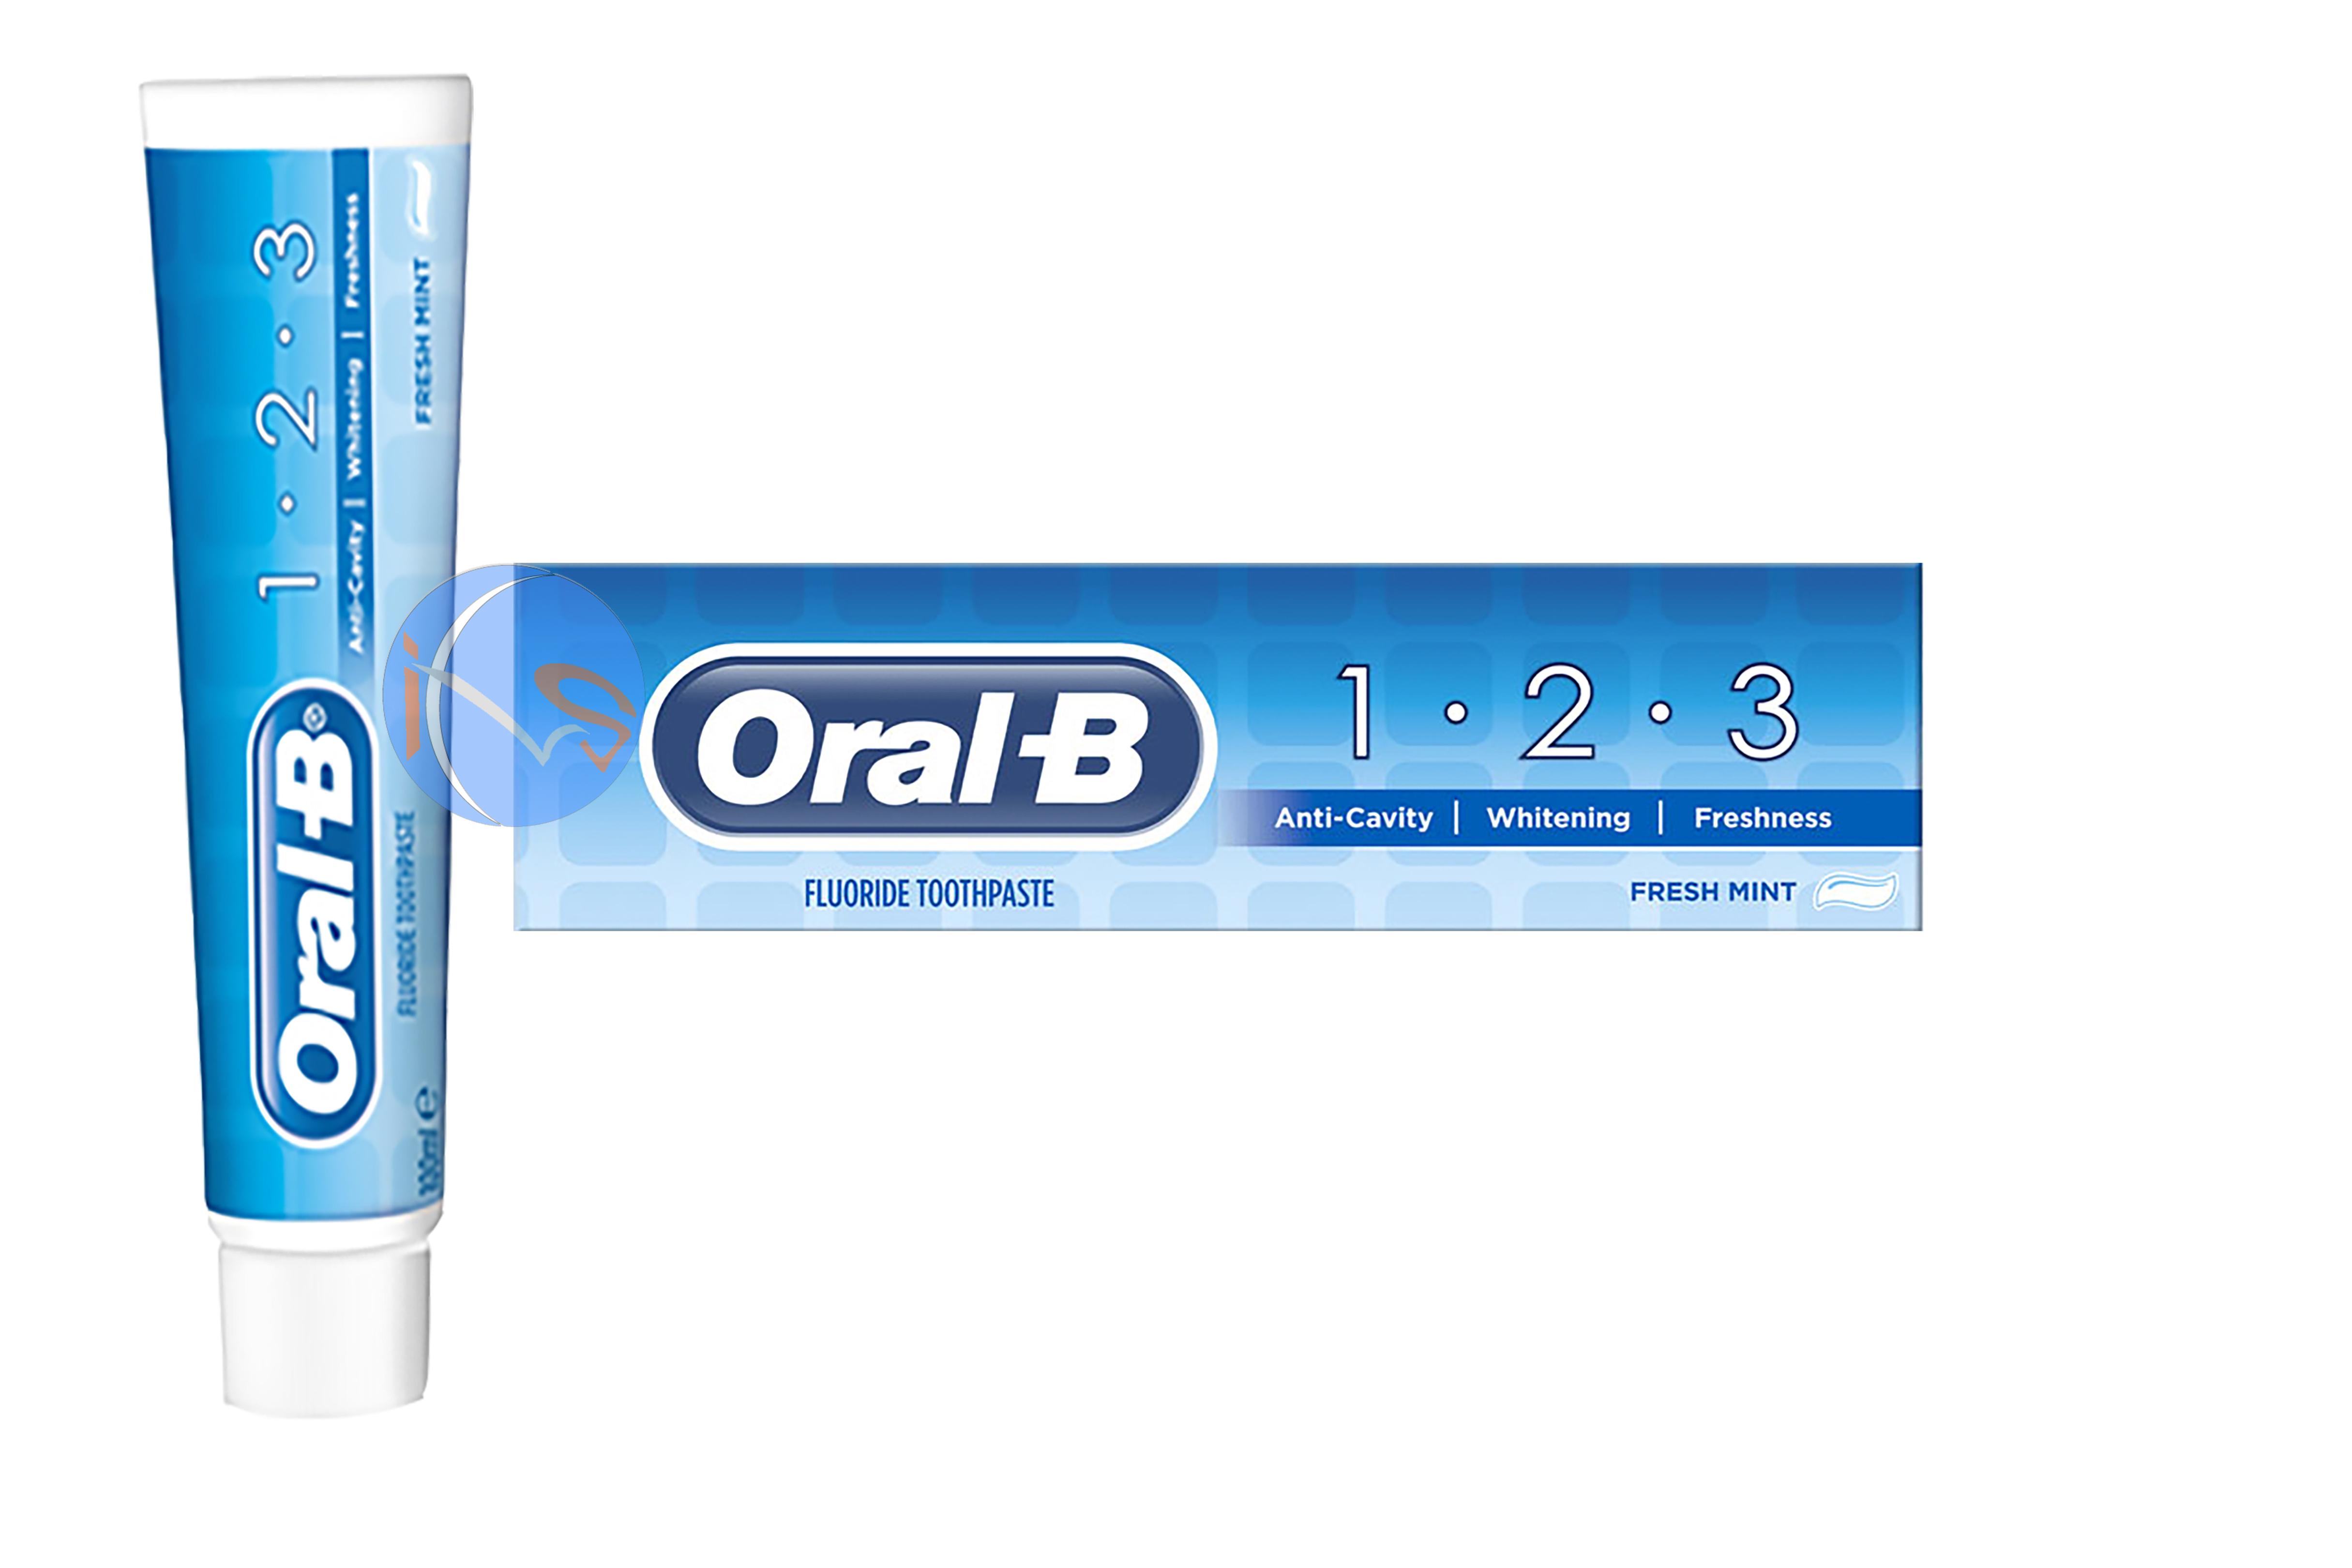 ORAL-B-123-ANTI-CAVITY-FLUORIDE-TOOTHPASTE-FRESH-